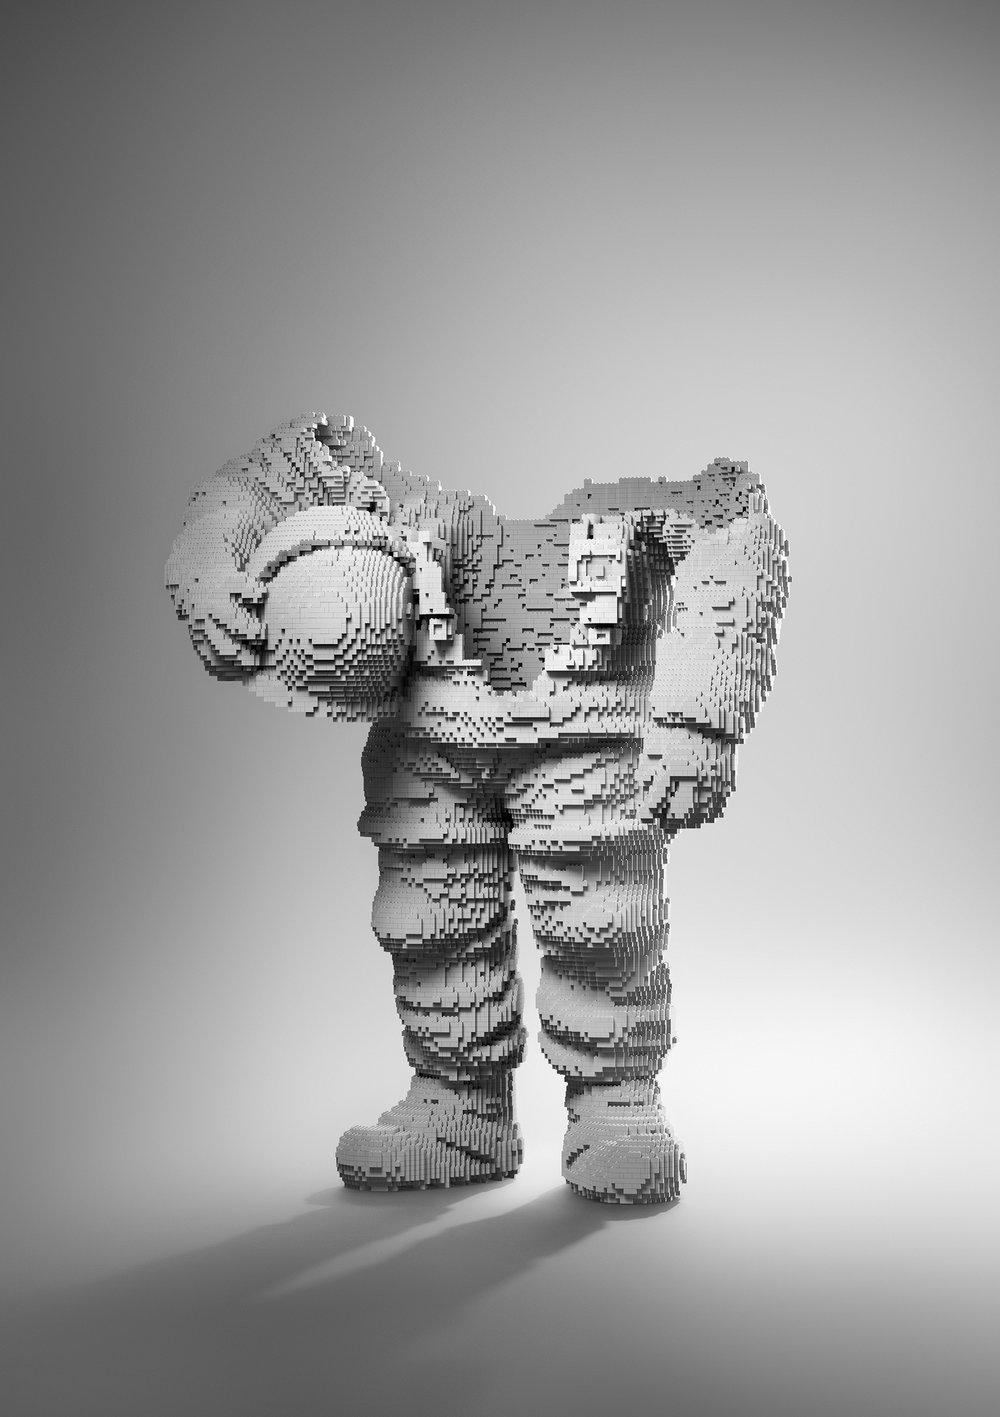 A_Astronaut_Model.jpg